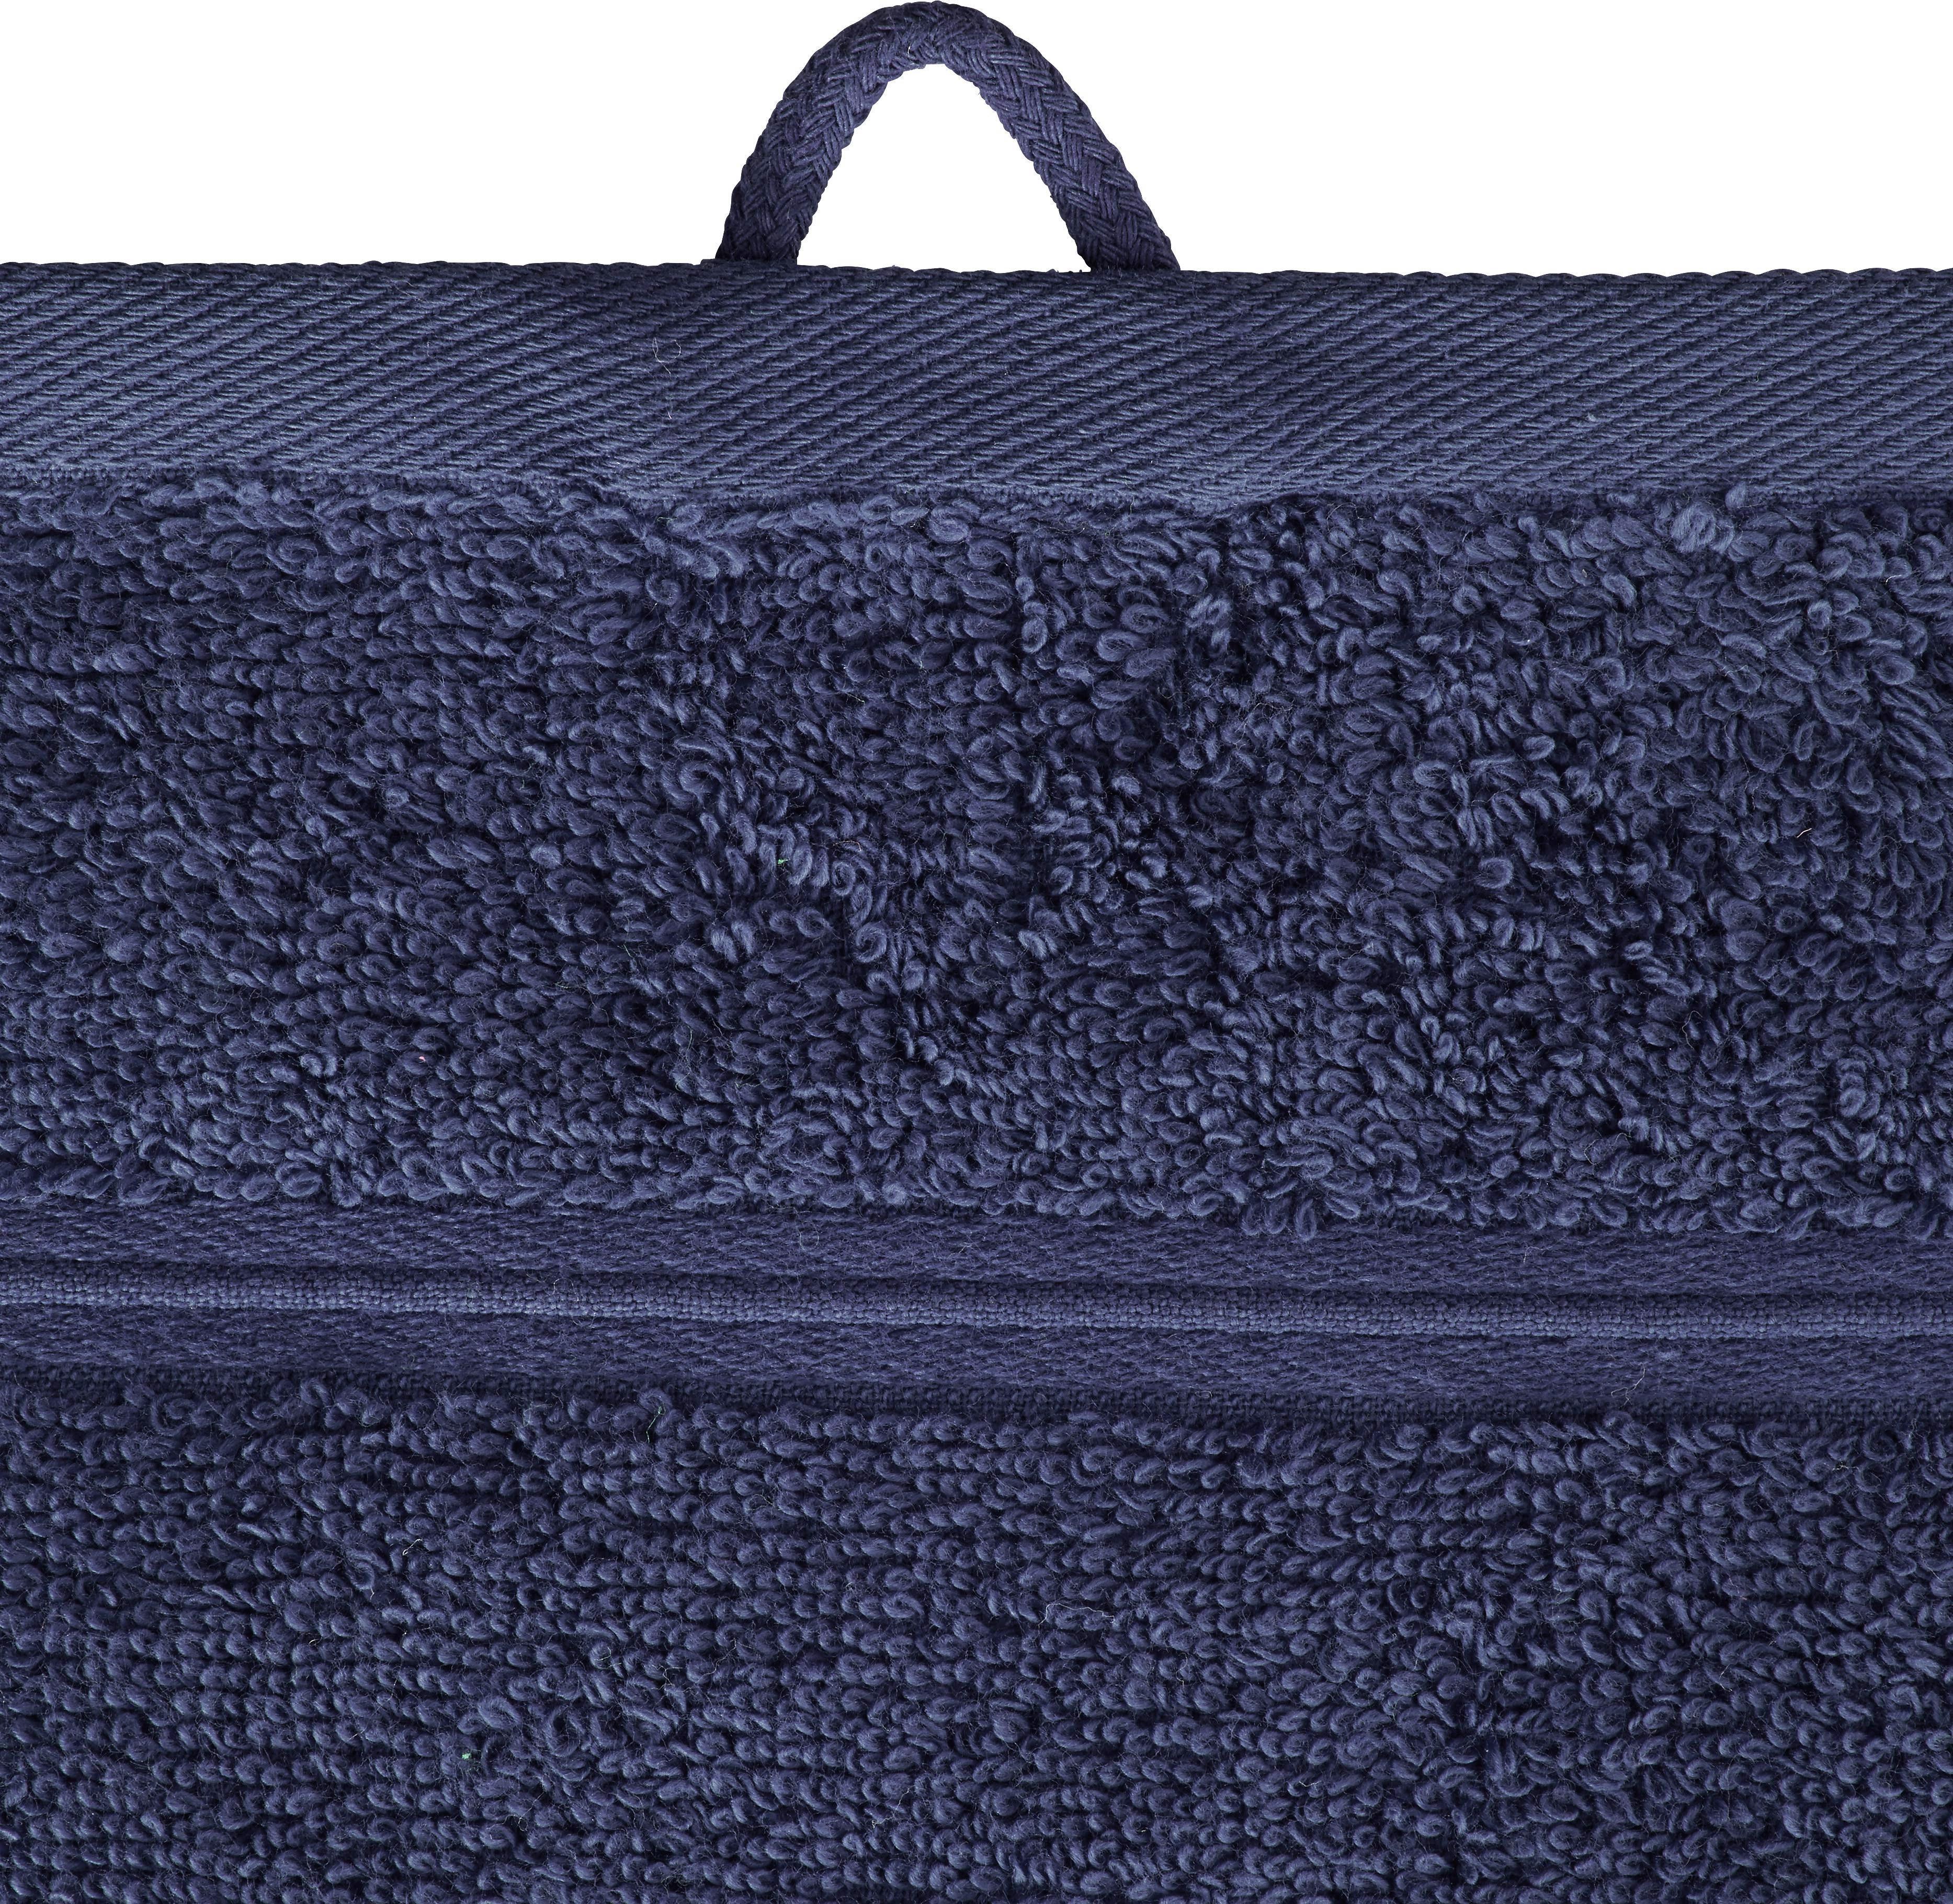 Handtuch Melanie in Blau - Blau, Textil (50/100cm) - MÖMAX modern living